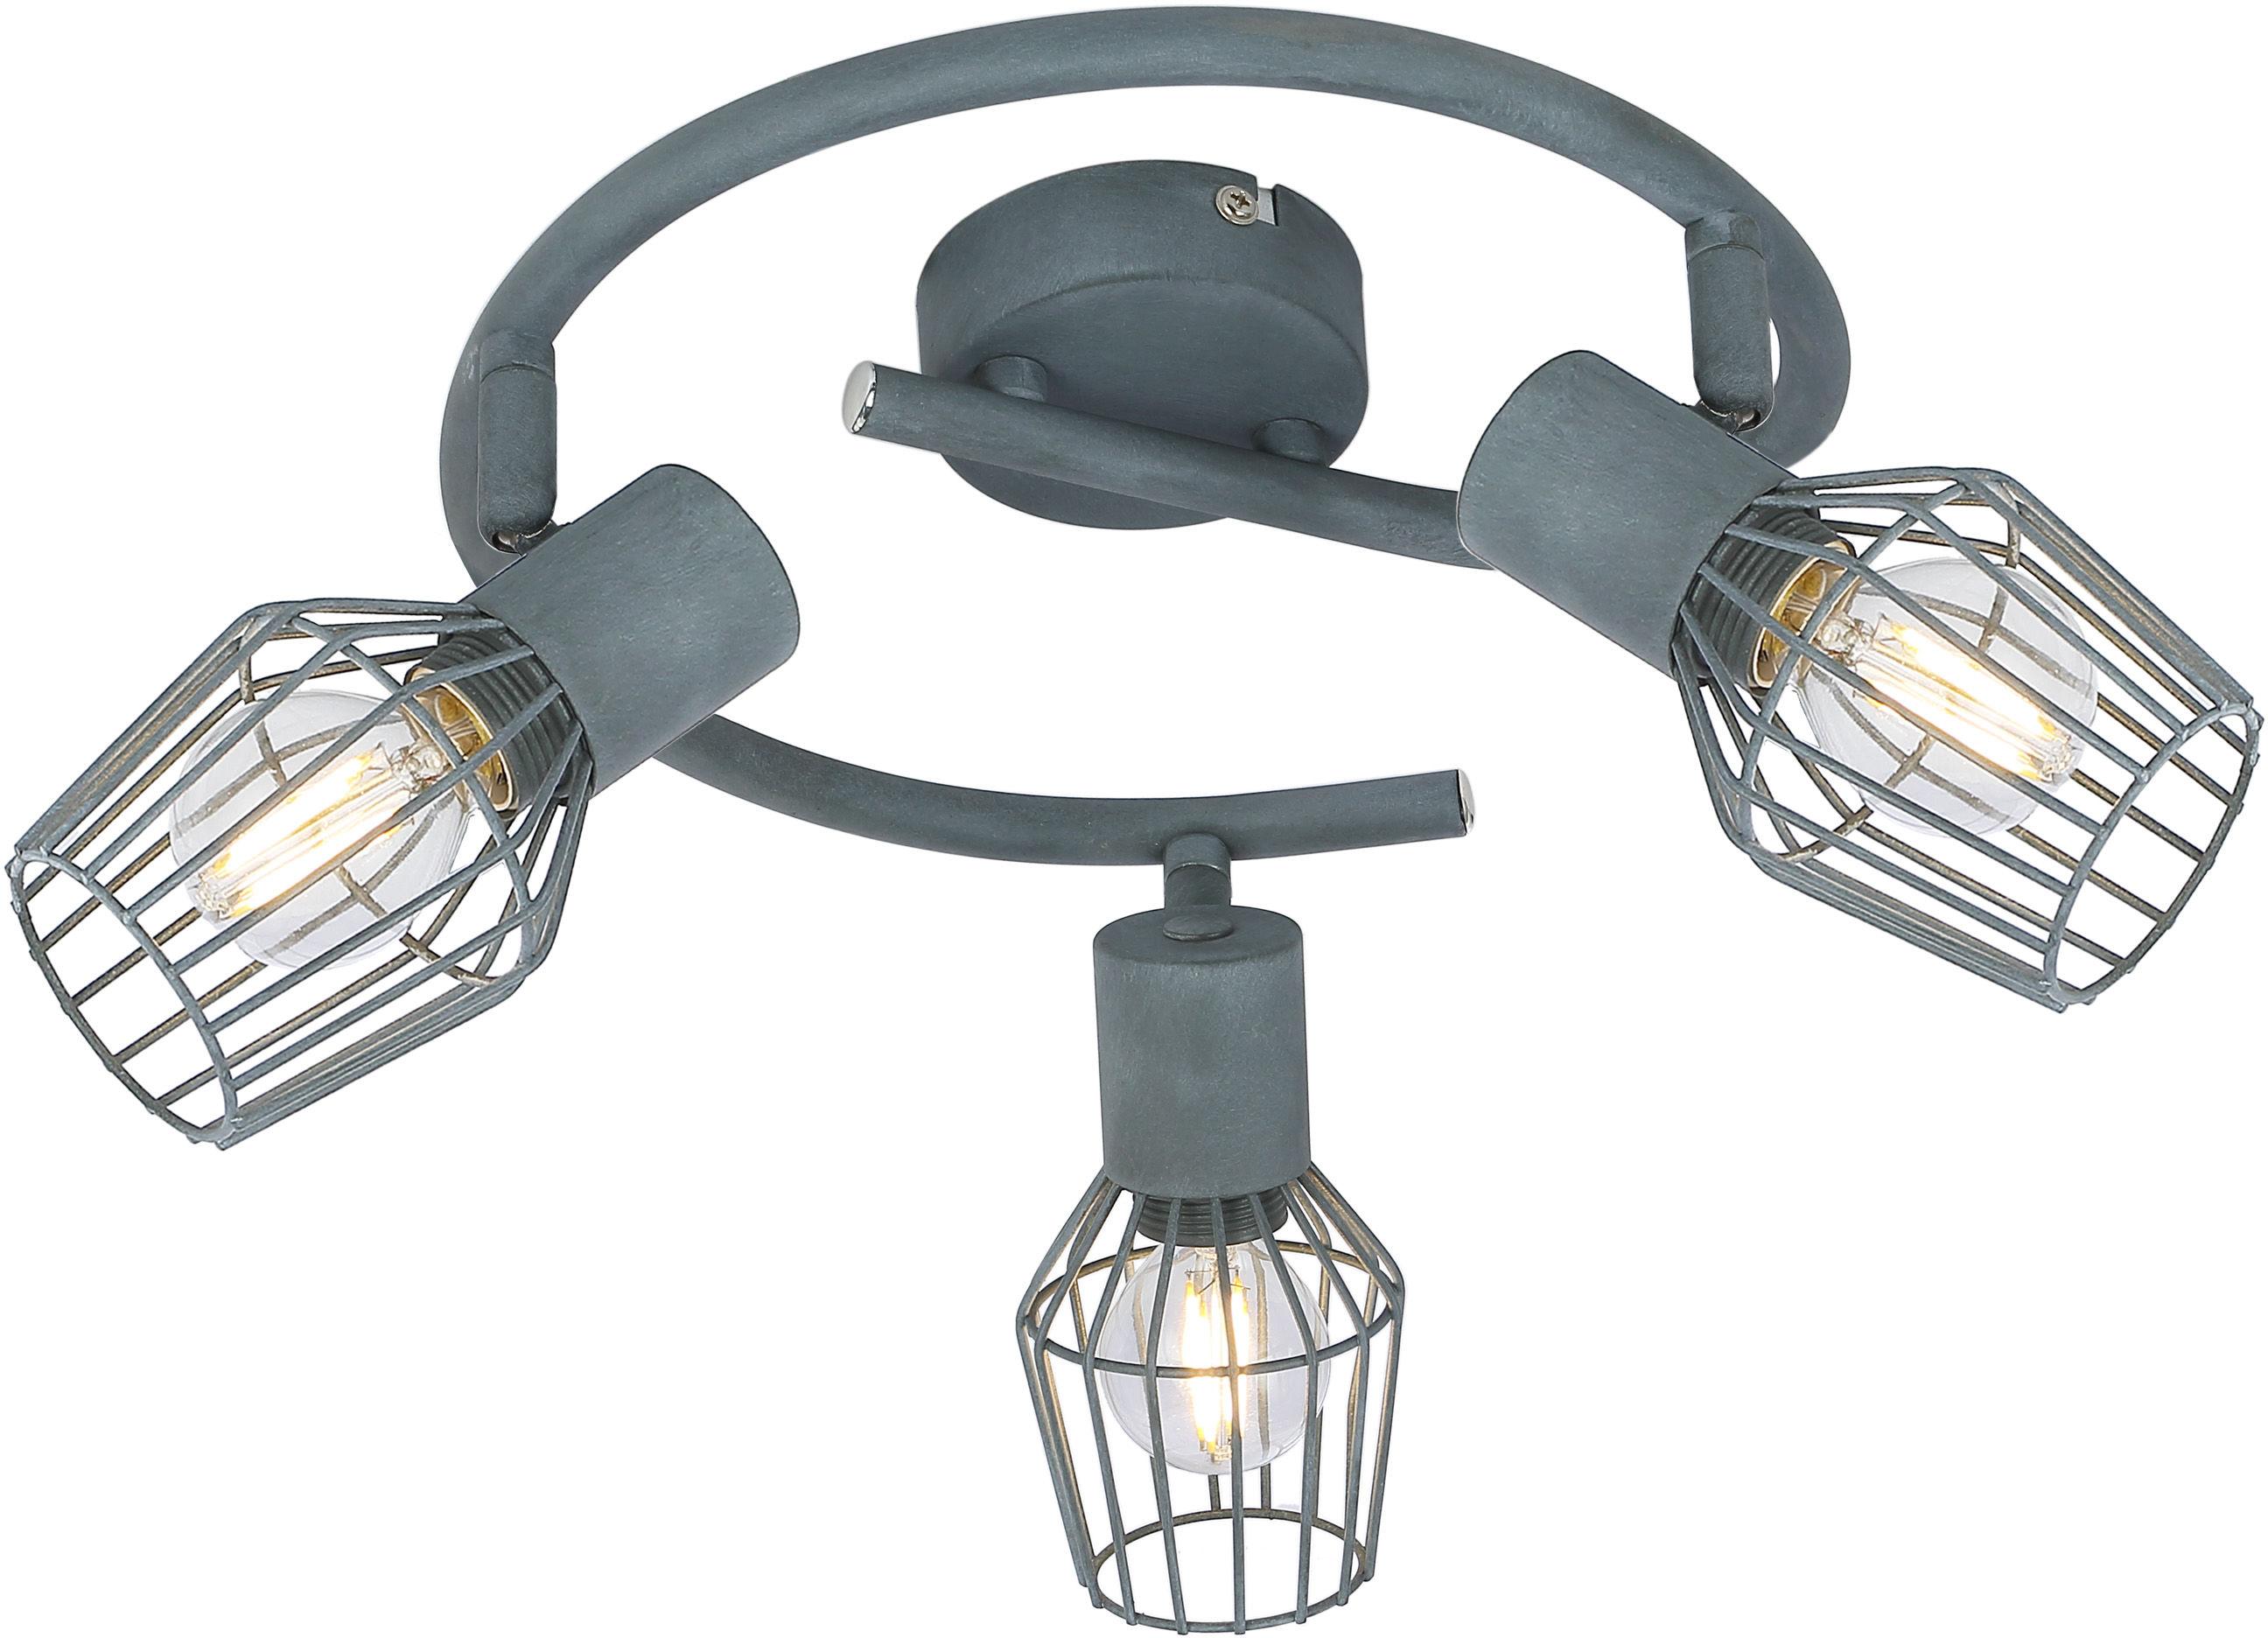 Candellux VIKING 98-68040 plafon lampa sufitowa spirala regulacja klosza szary 3X40W E14 43cm